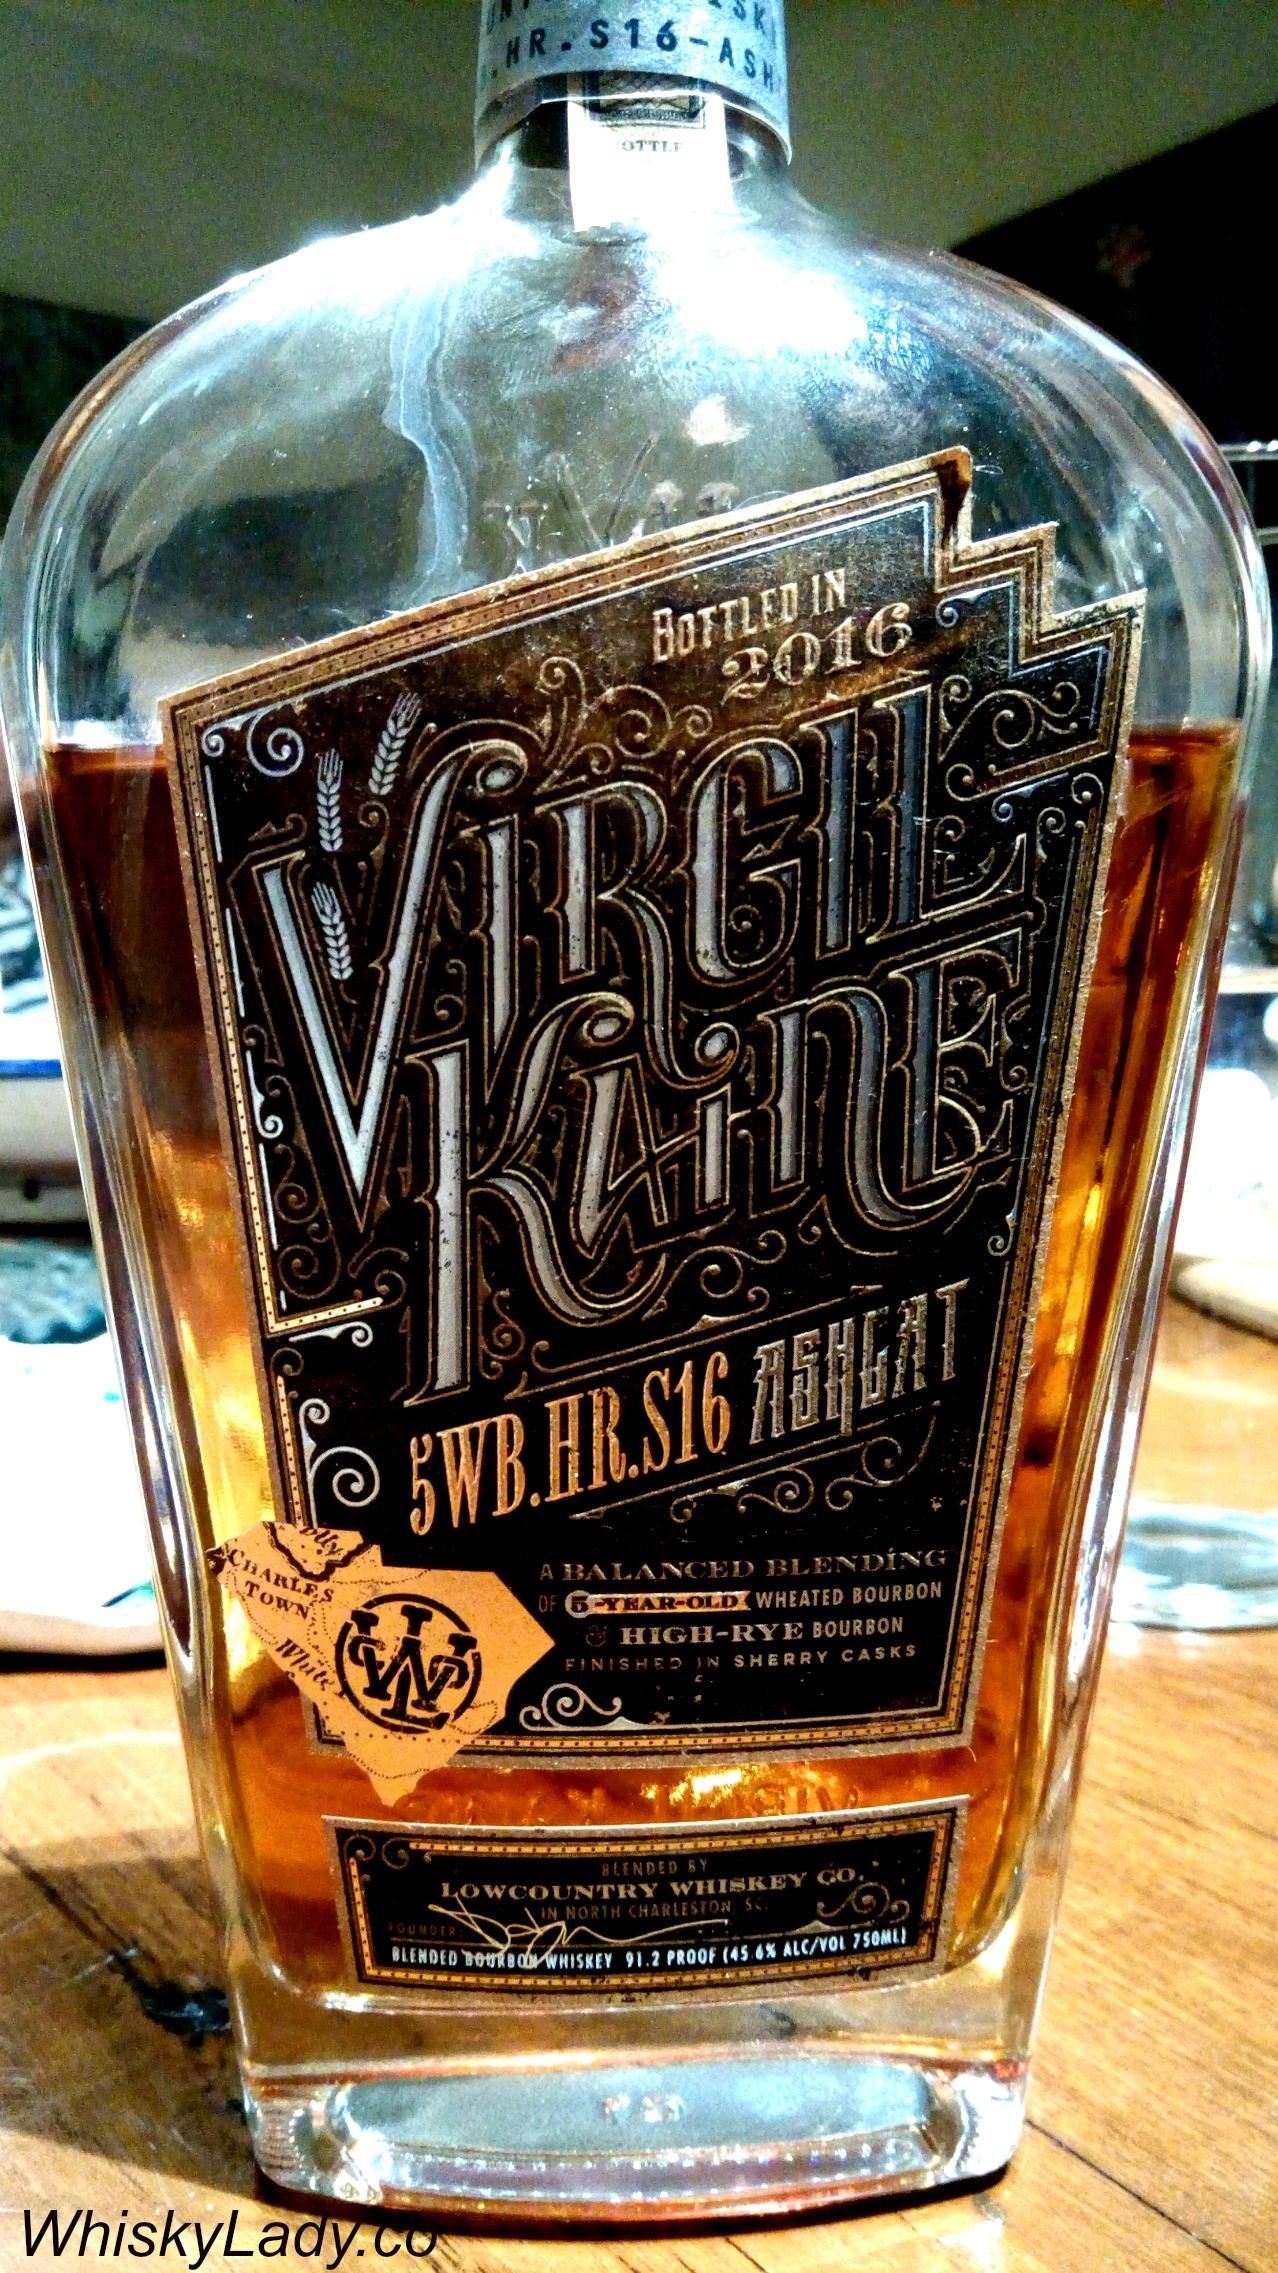 Risky Whisky Virgil Kaine 2016 Ashcat 45 6 Whisky Lady